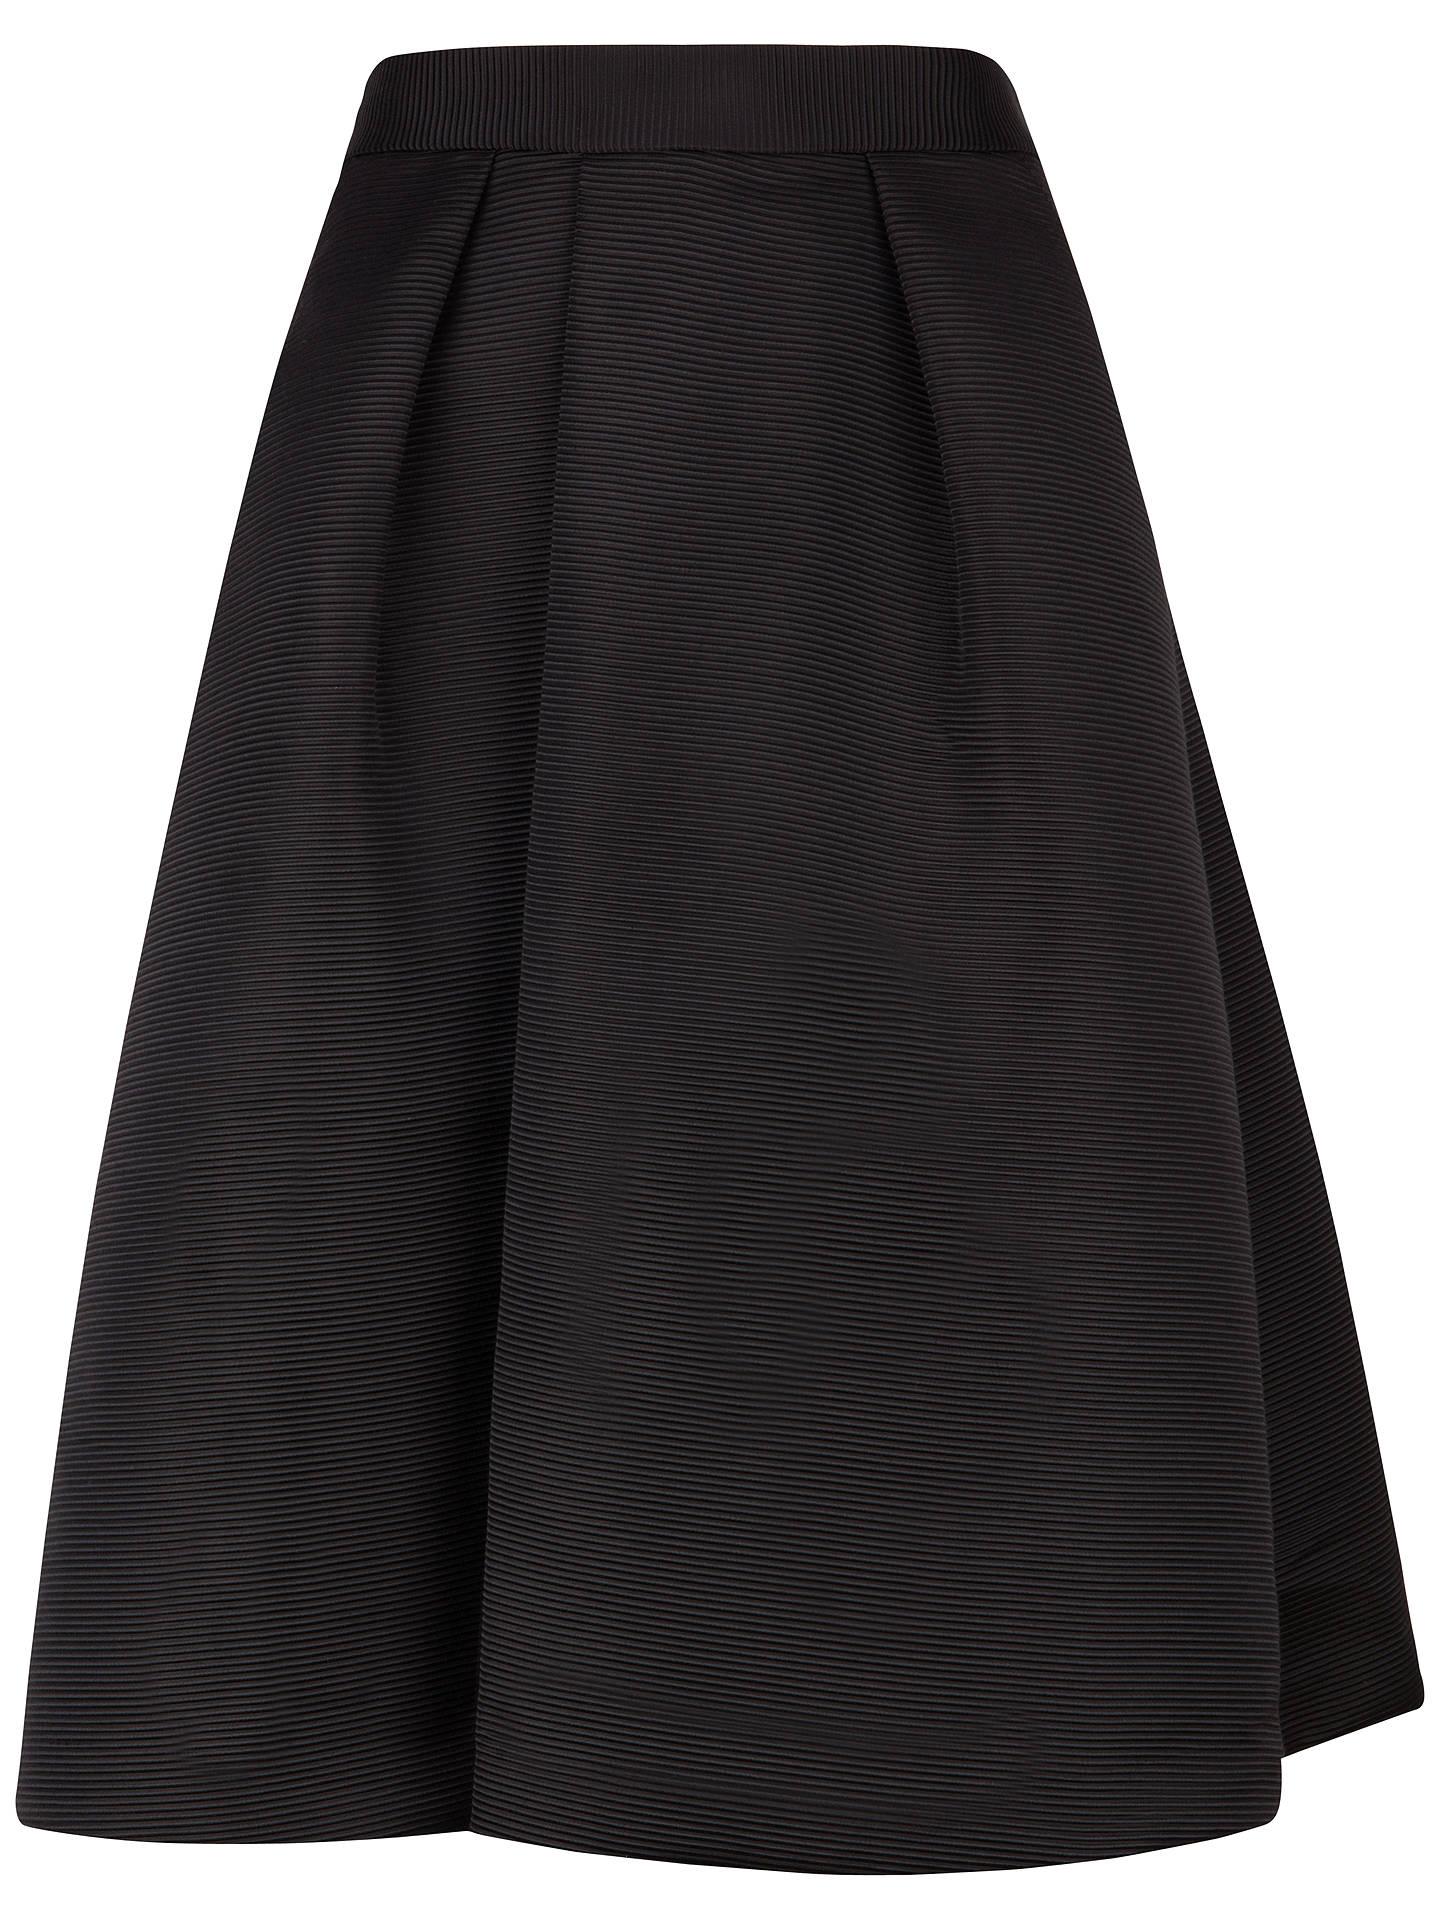 79ecac76b414 Ted Baker Zelida Midi Skirt at John Lewis   Partners